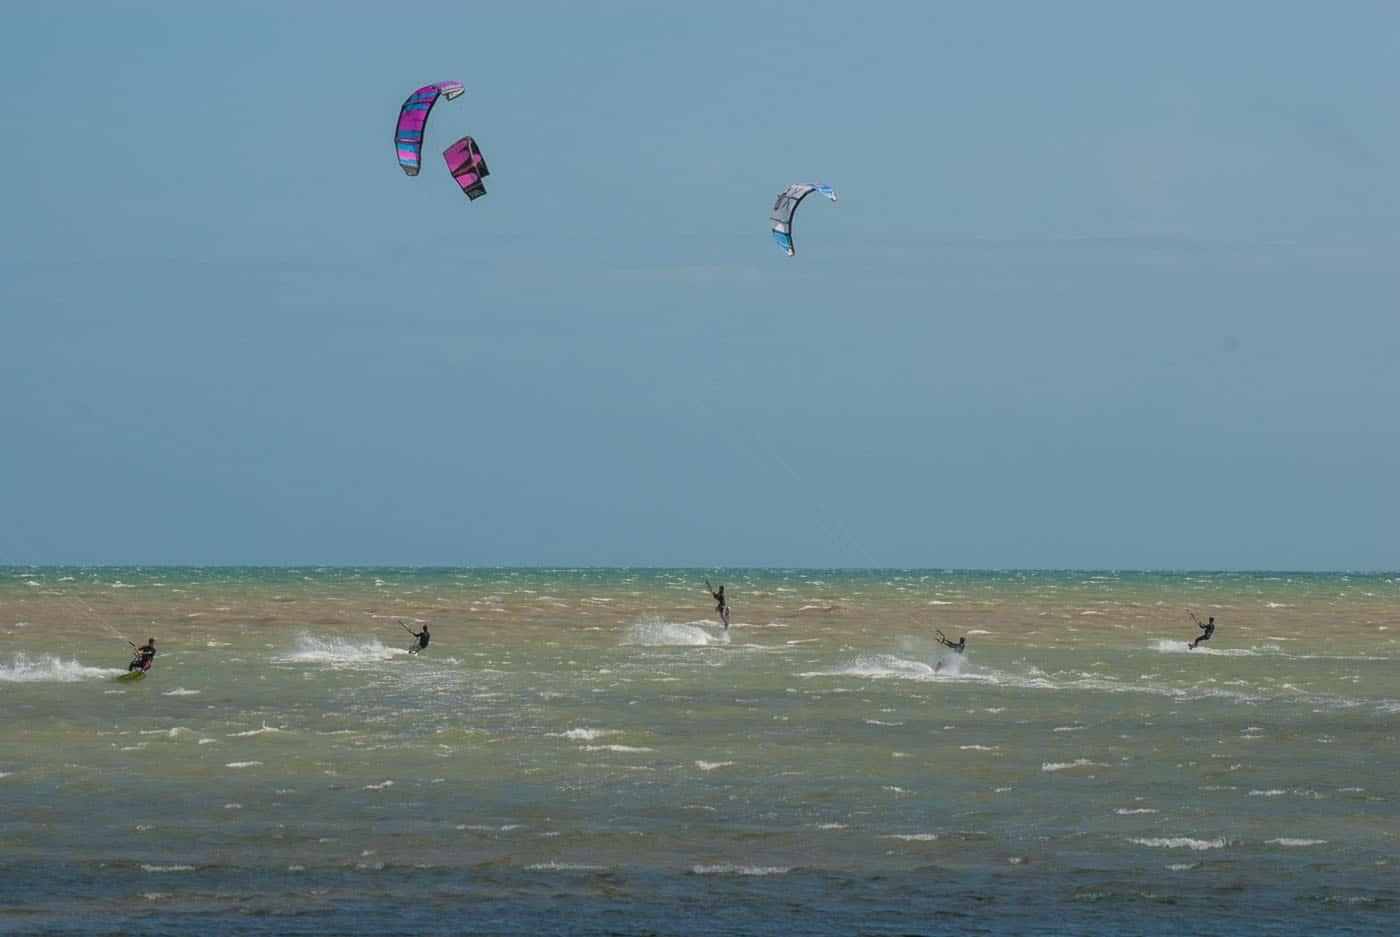 Littlehampton Kitesurfing at Littlehampton and Rustington beaches, West Sussex